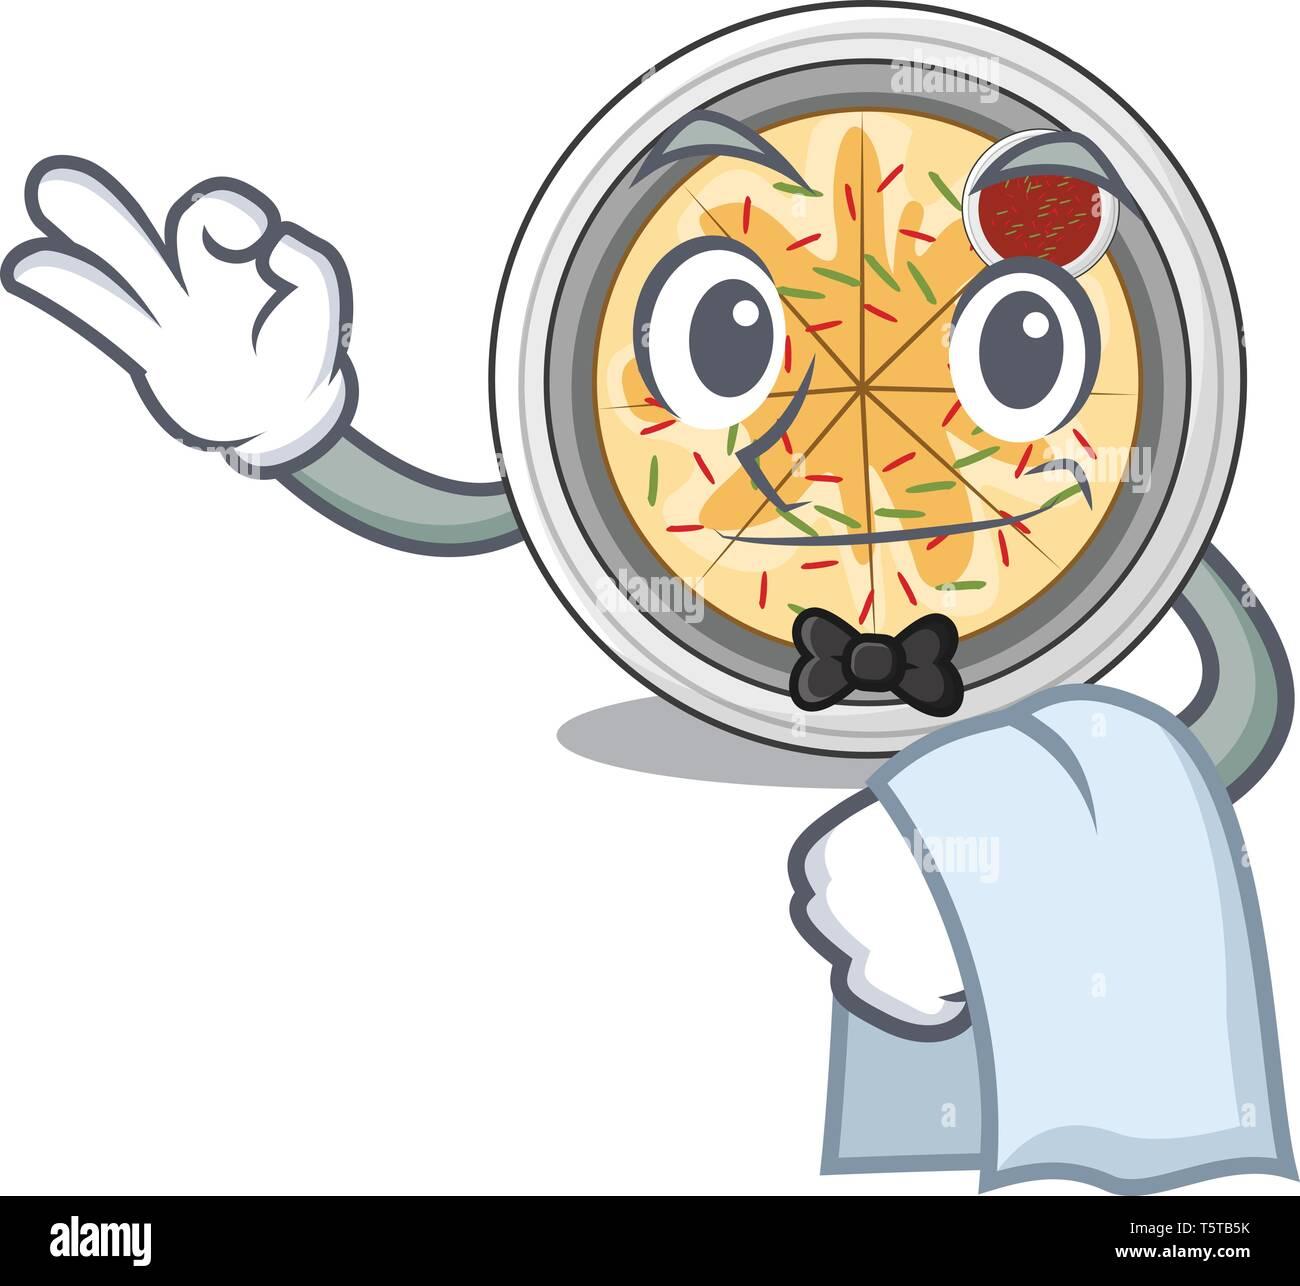 Waiter buchimgae isolated with in the mascot - Stock Vector